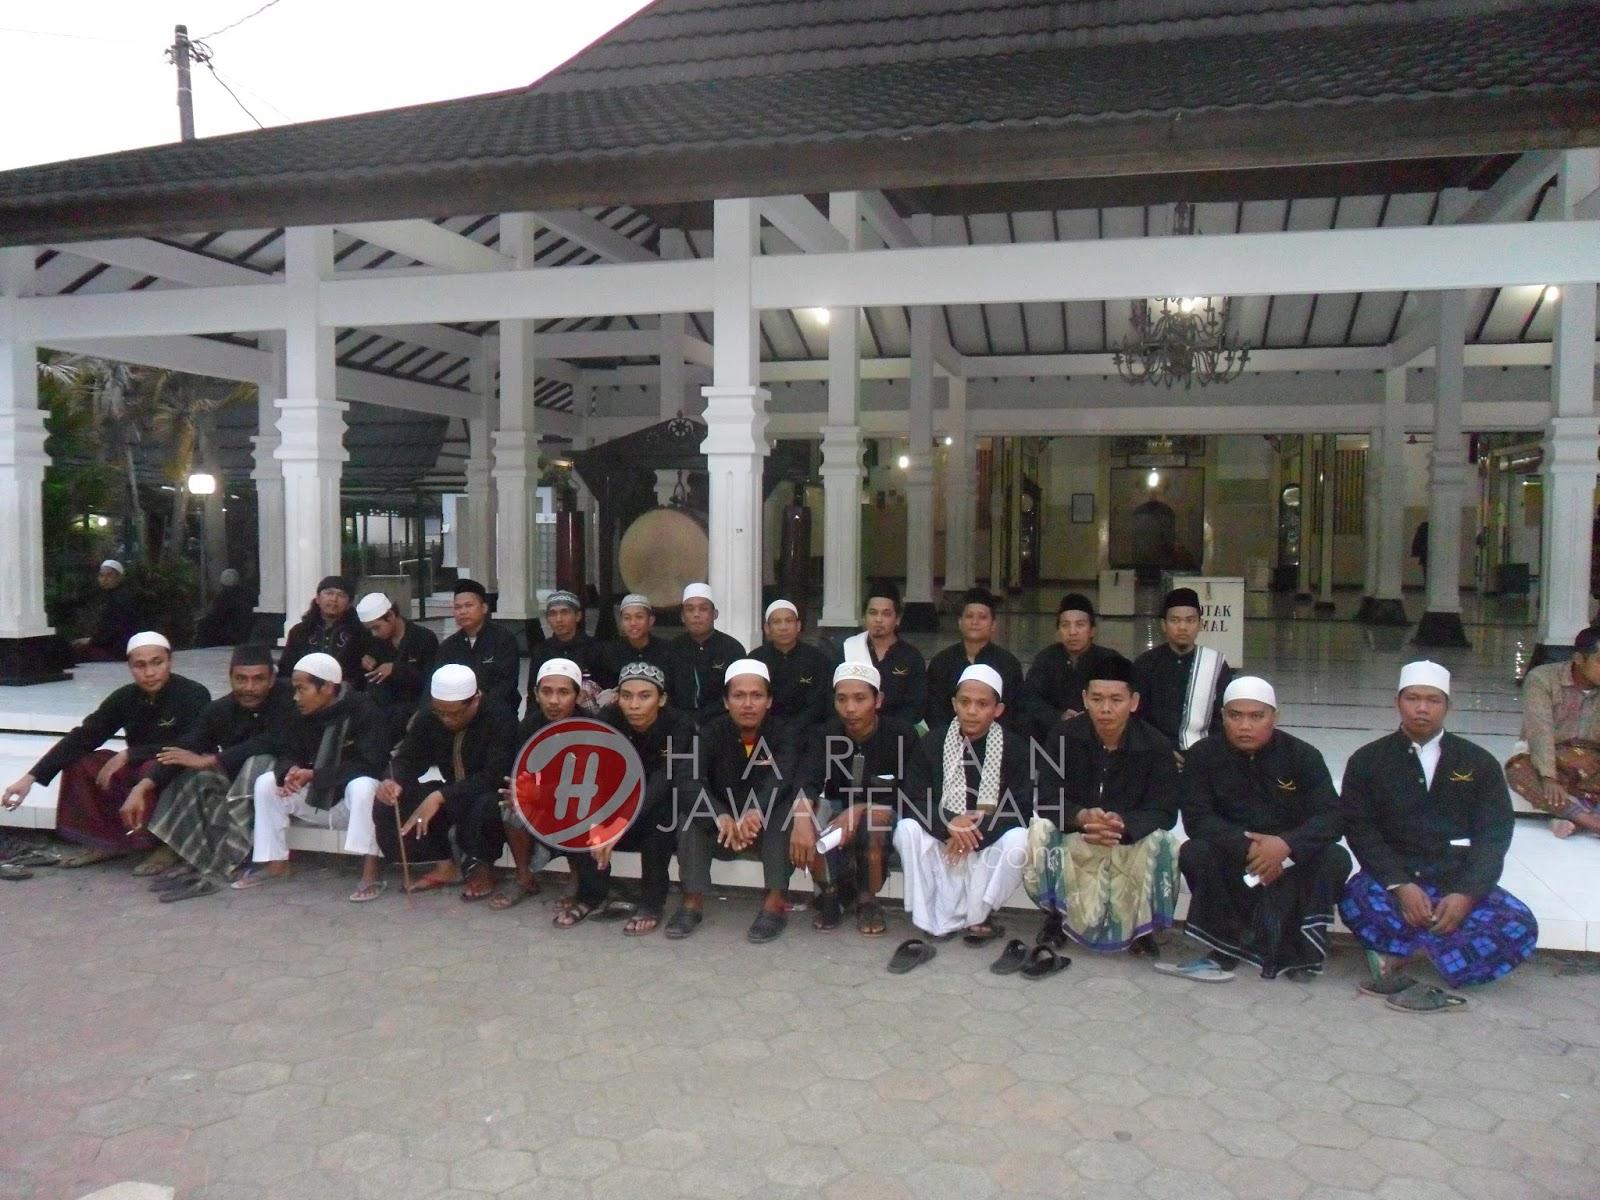 Berwisata Di Masjid Sunan Kalijaga Demak Yuk Harian Jateng